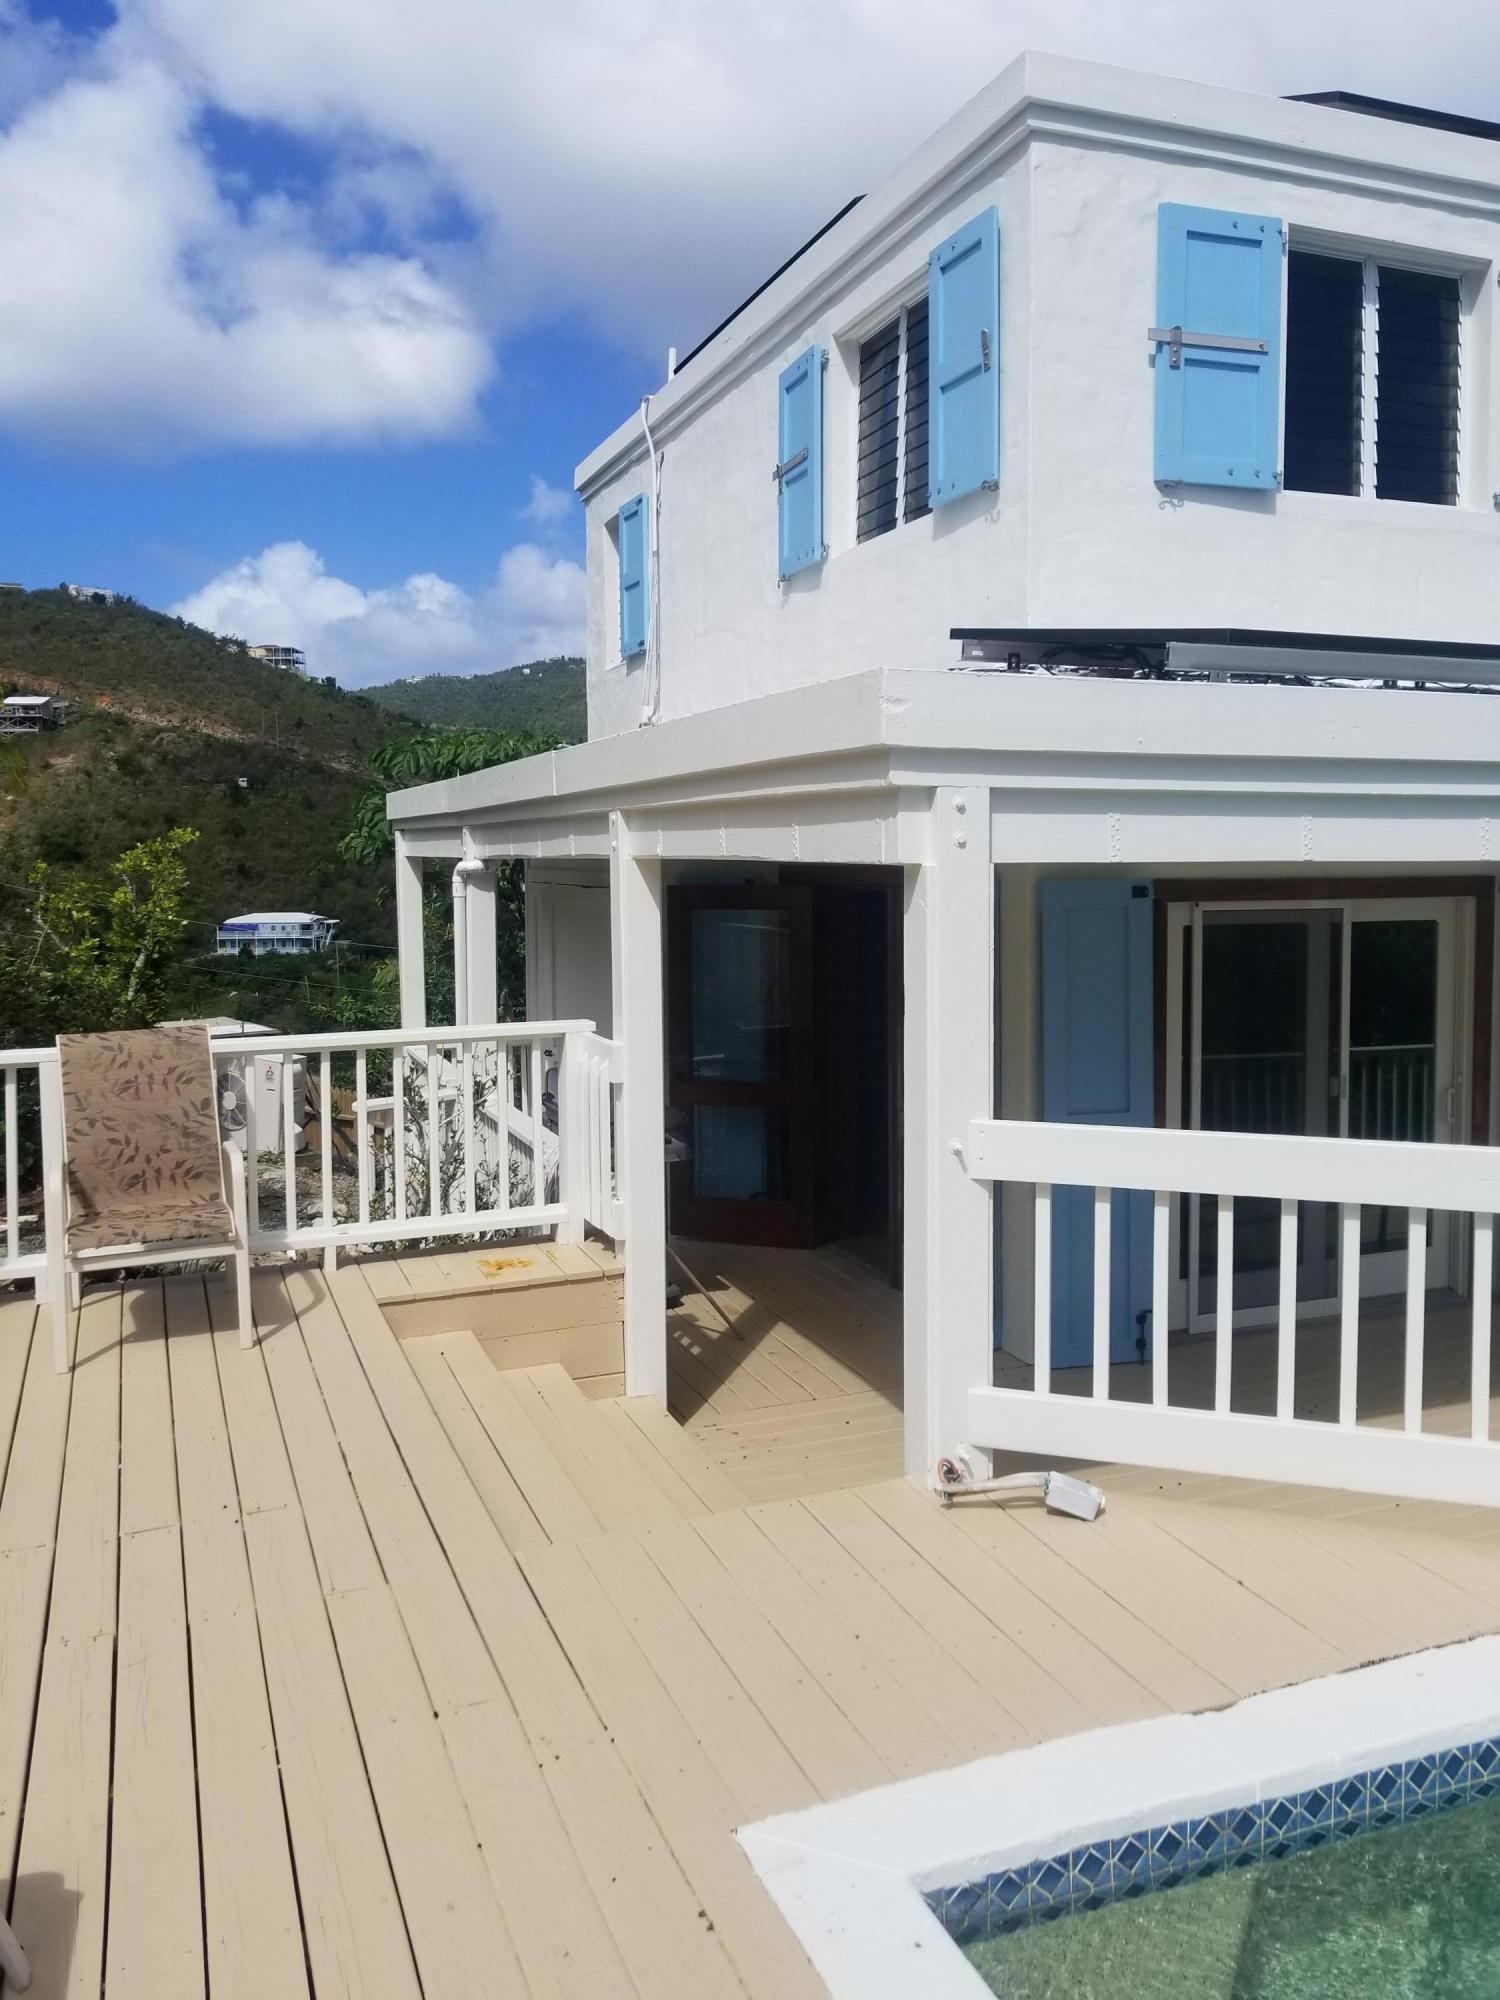 St John, Virgin Islands 00830, 3 Bedrooms Bedrooms, ,3 BathroomsBathrooms,Residential,For Sale,19-40